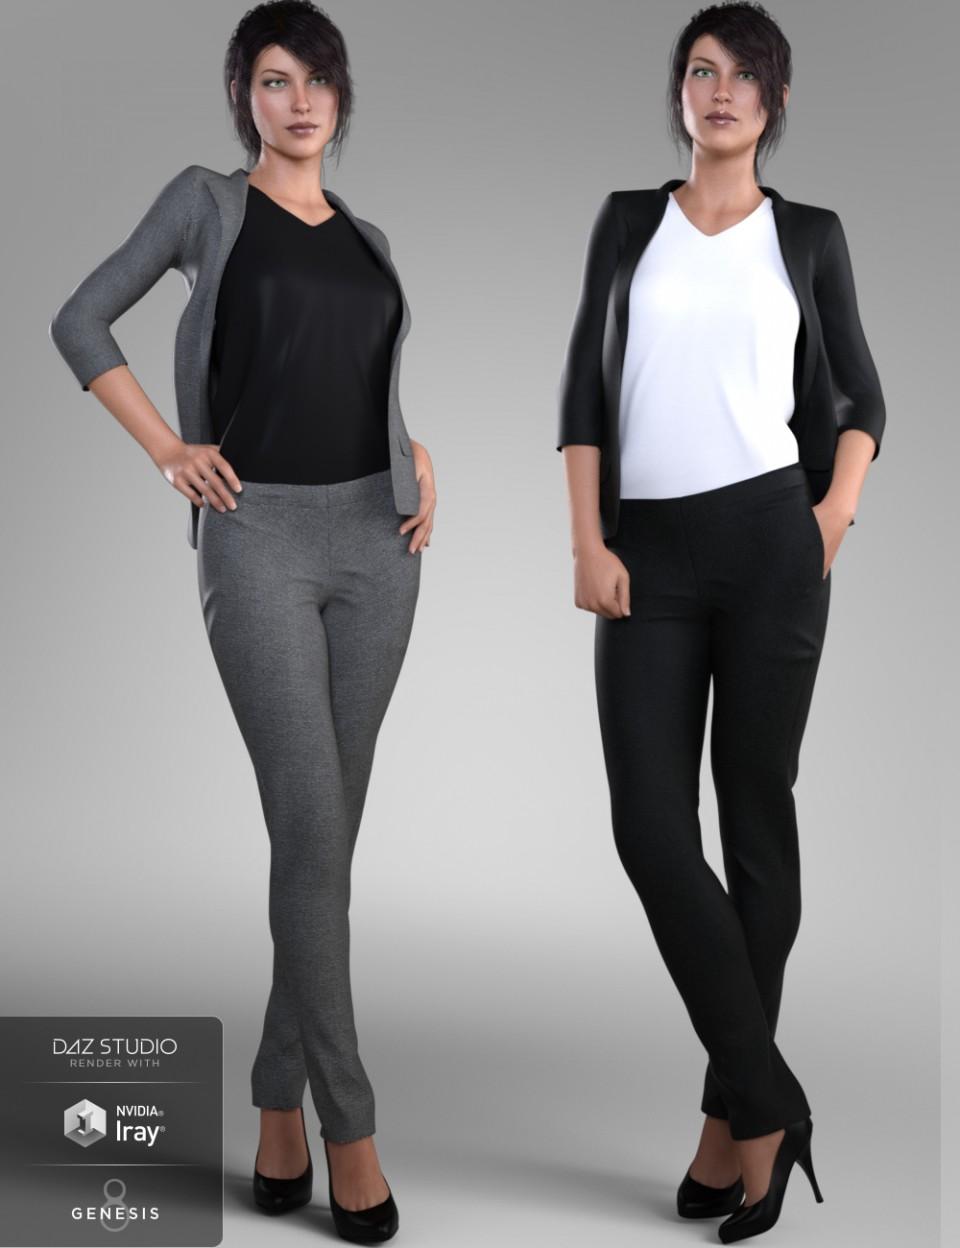 Stylish Workwear for Genesis 8 Female(s)